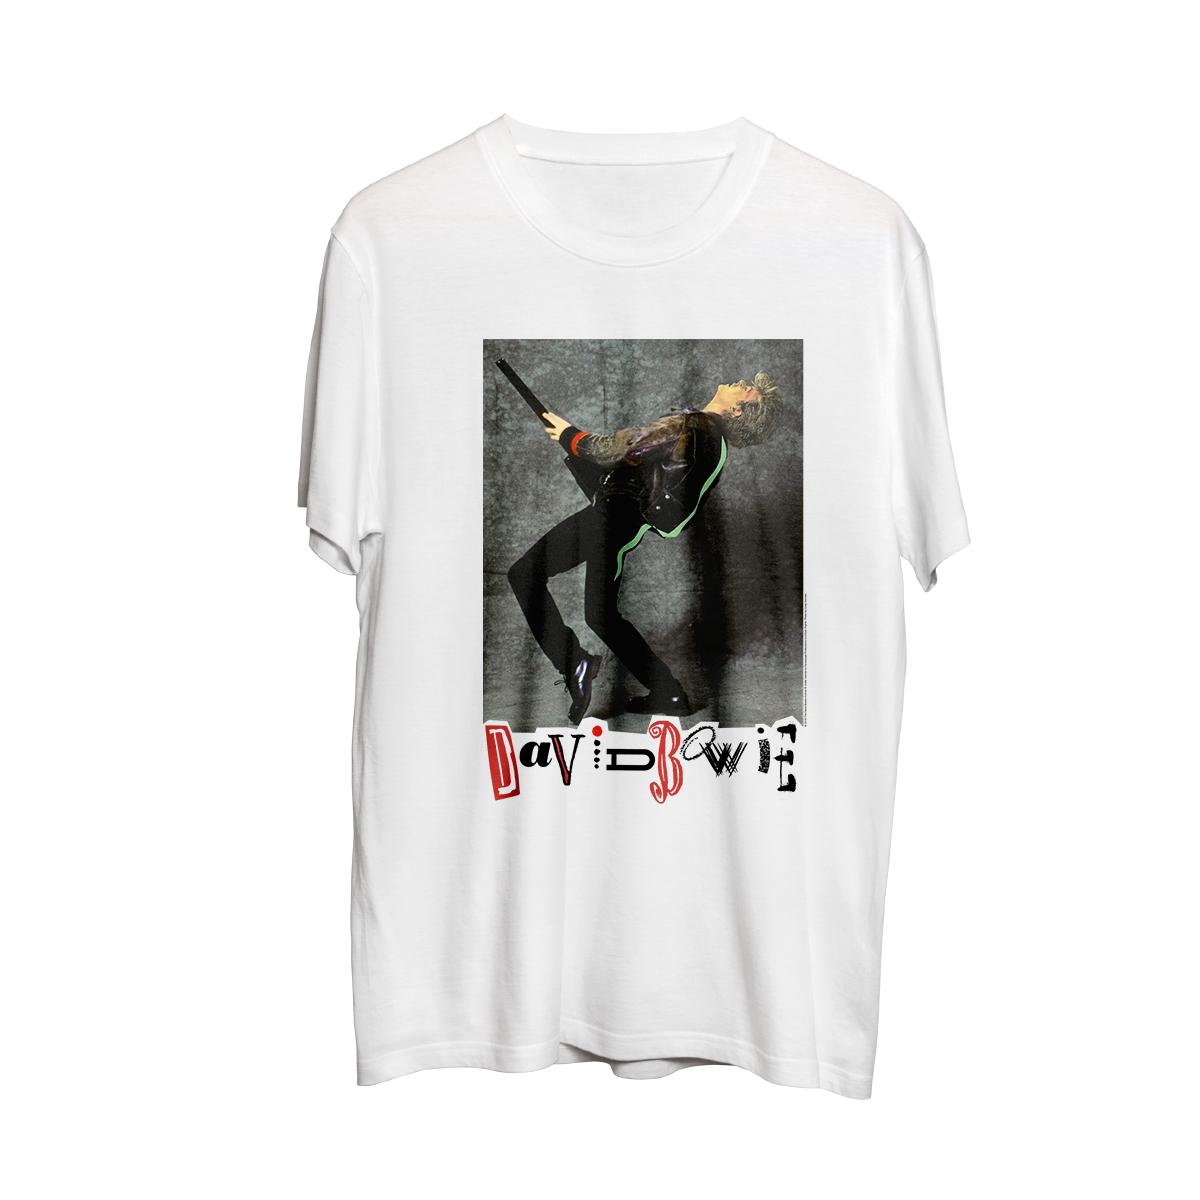 David Bowie Glass Spider Replica Tour T-shirt